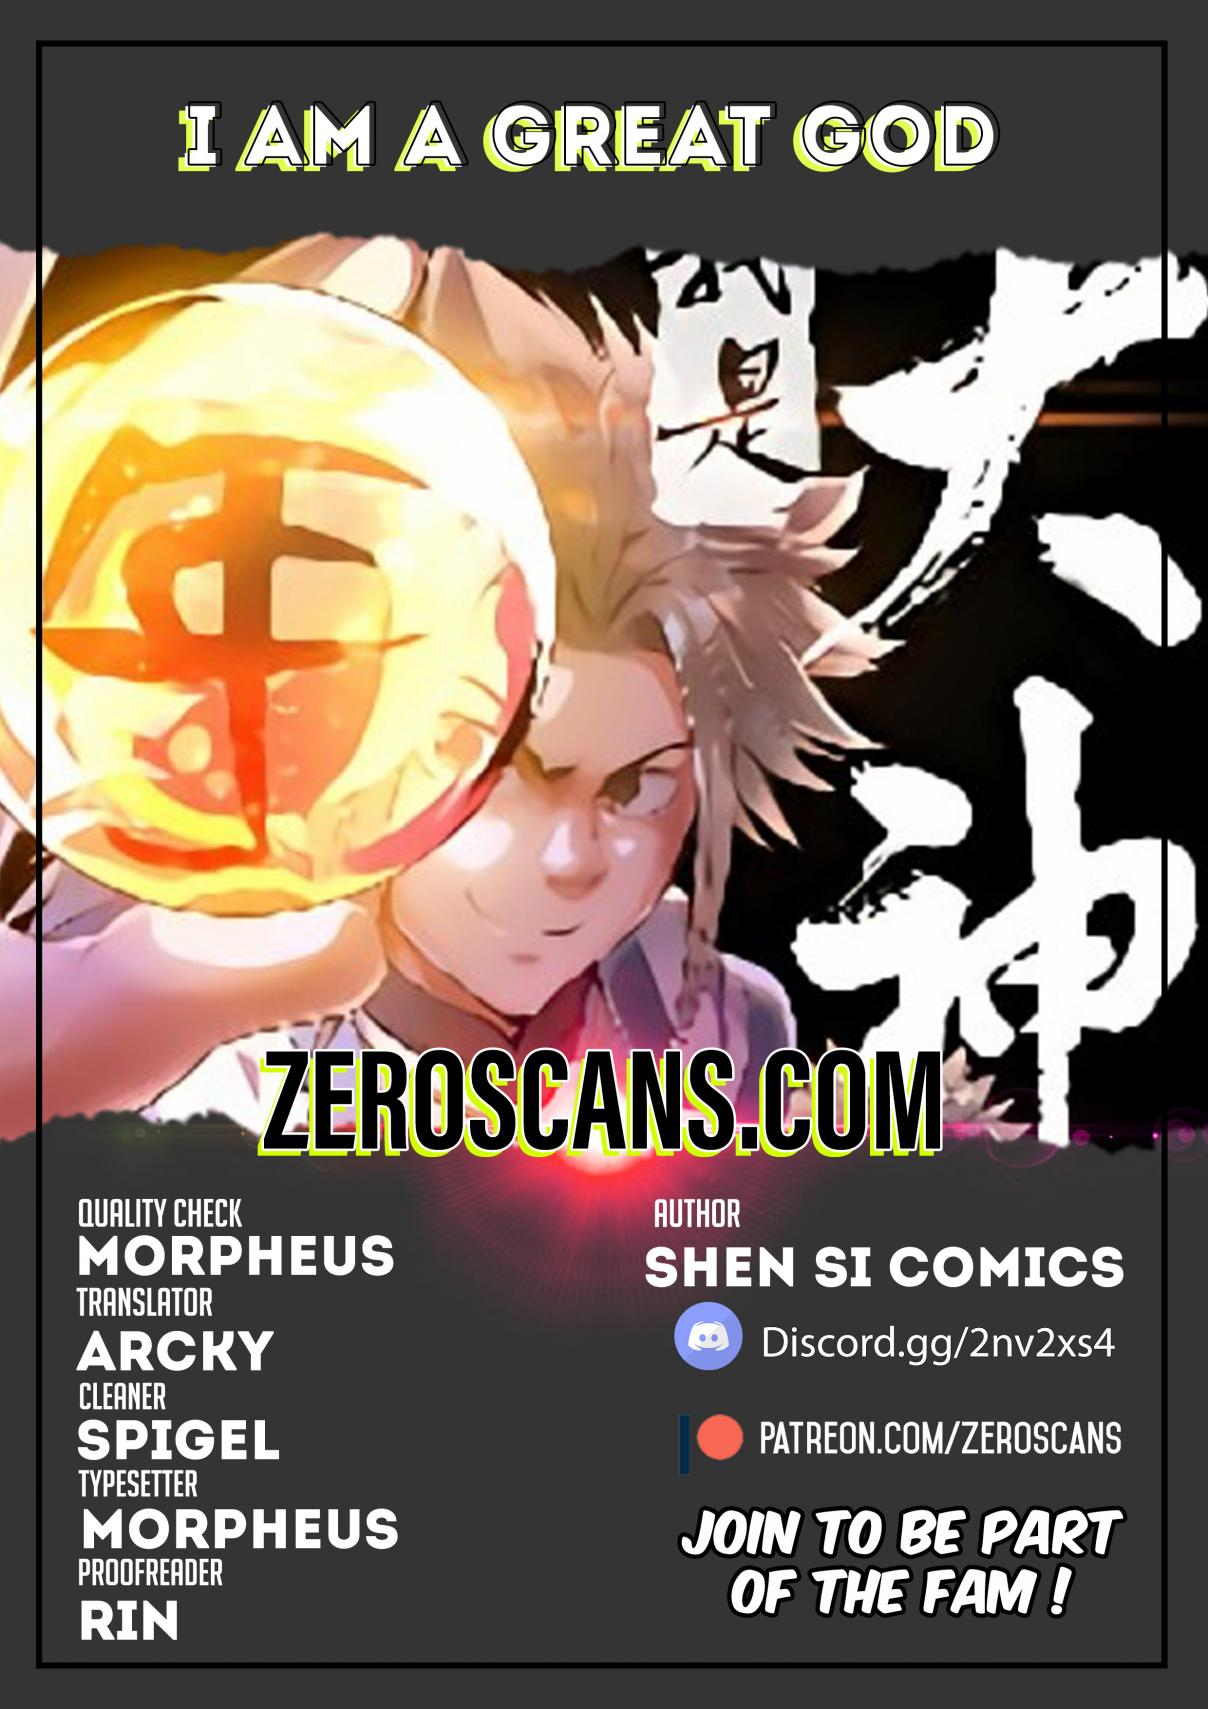 https://im.nineanime.com/comics/pic9/4/21124/491110/7bfca2b13a228102a0a8909b6ea2aae7.jpg Page 1